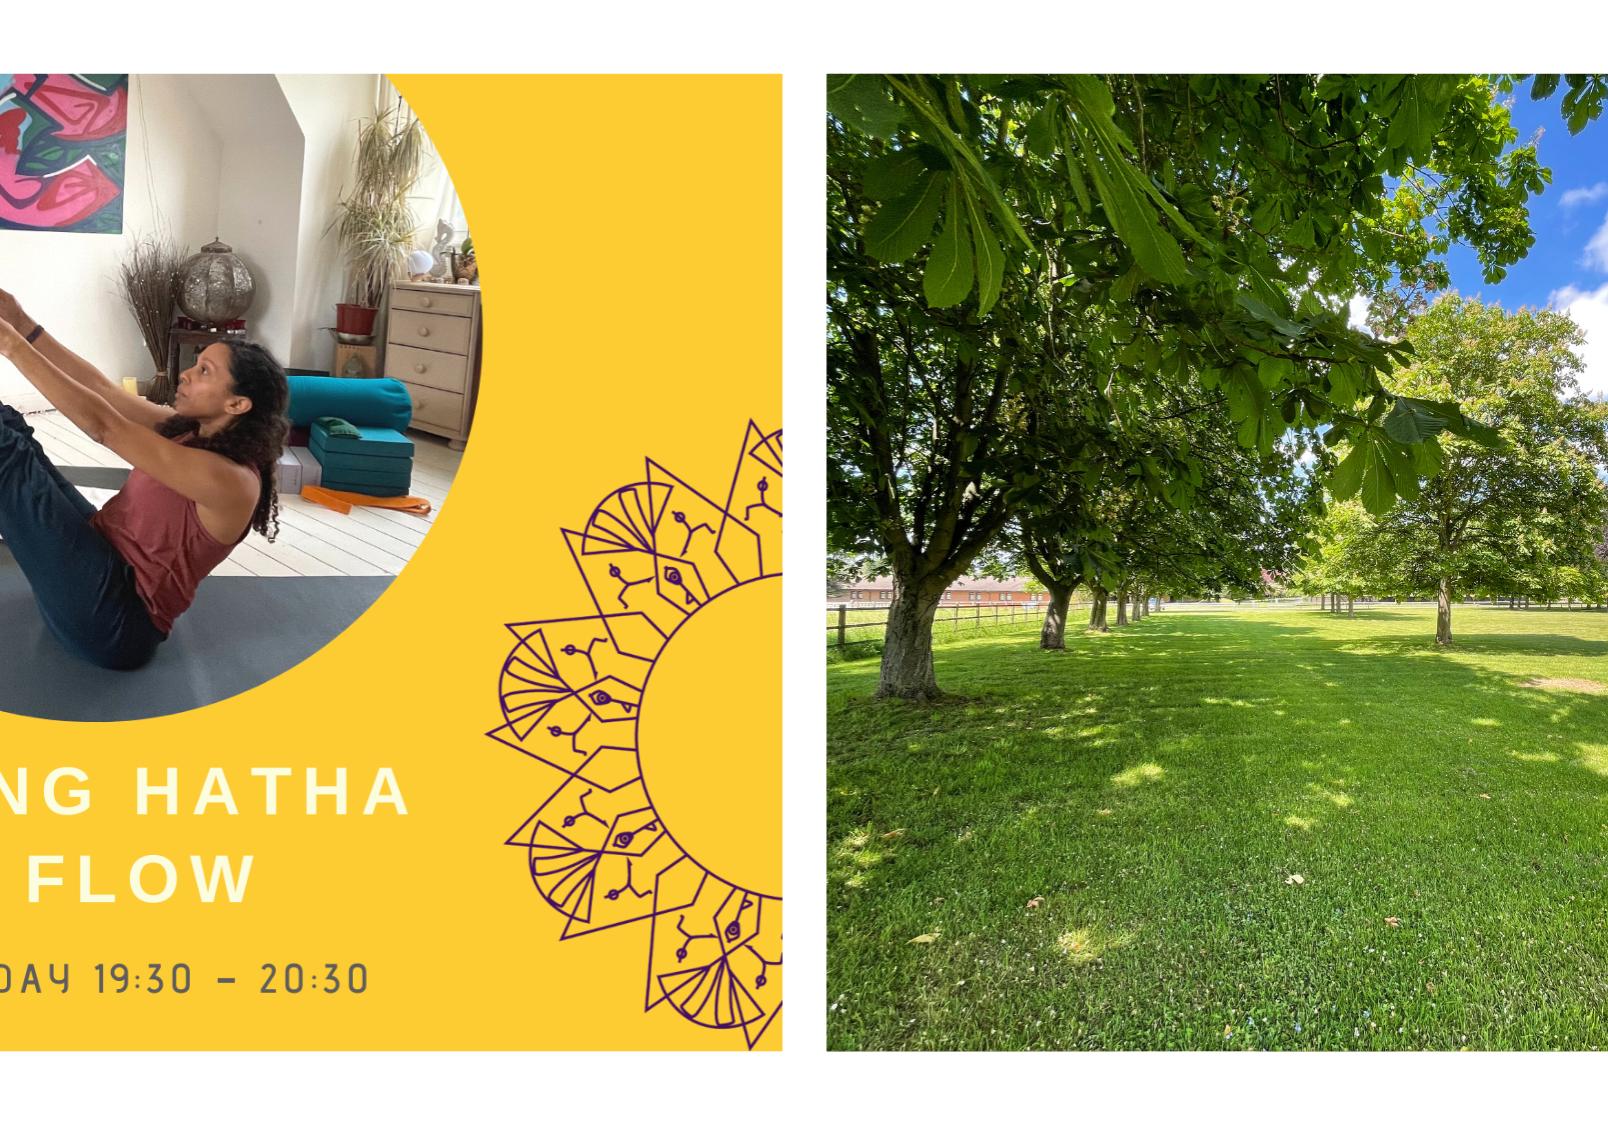 2.-Monday-19.30-20.30-Horsley-Estate-Mele-Yoga-Yang-Hatha-Flow.png